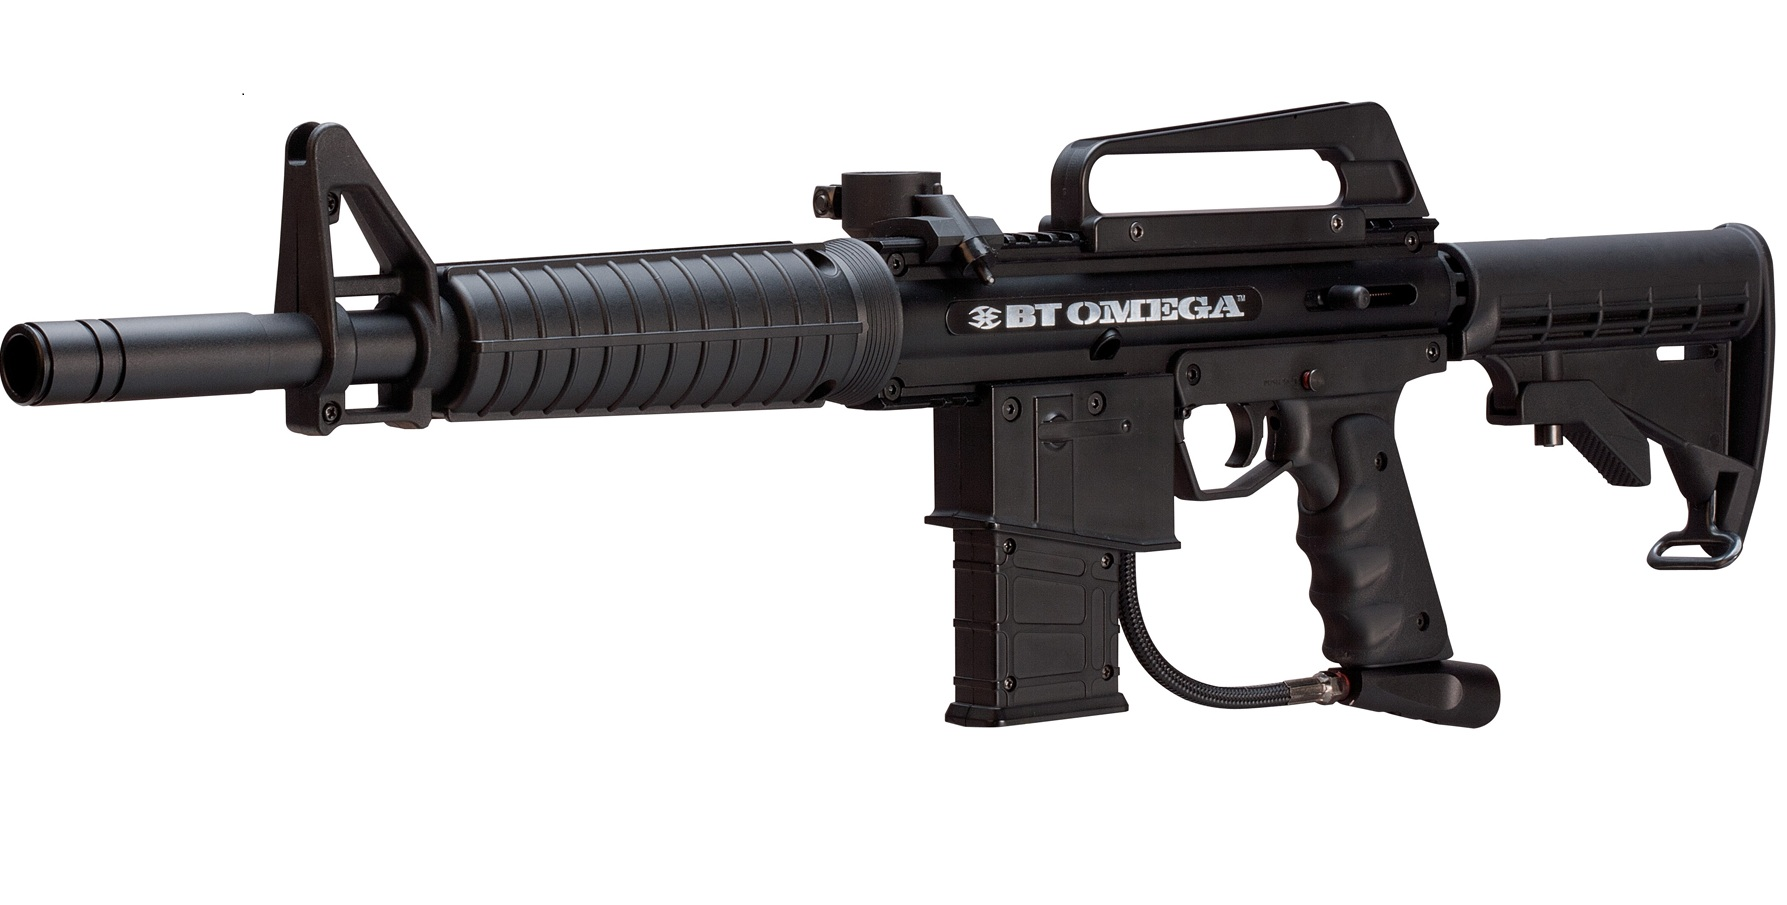 pb_bt_omegablk_17041_empire_bt_omega_paintball_gun_black_1.jpg